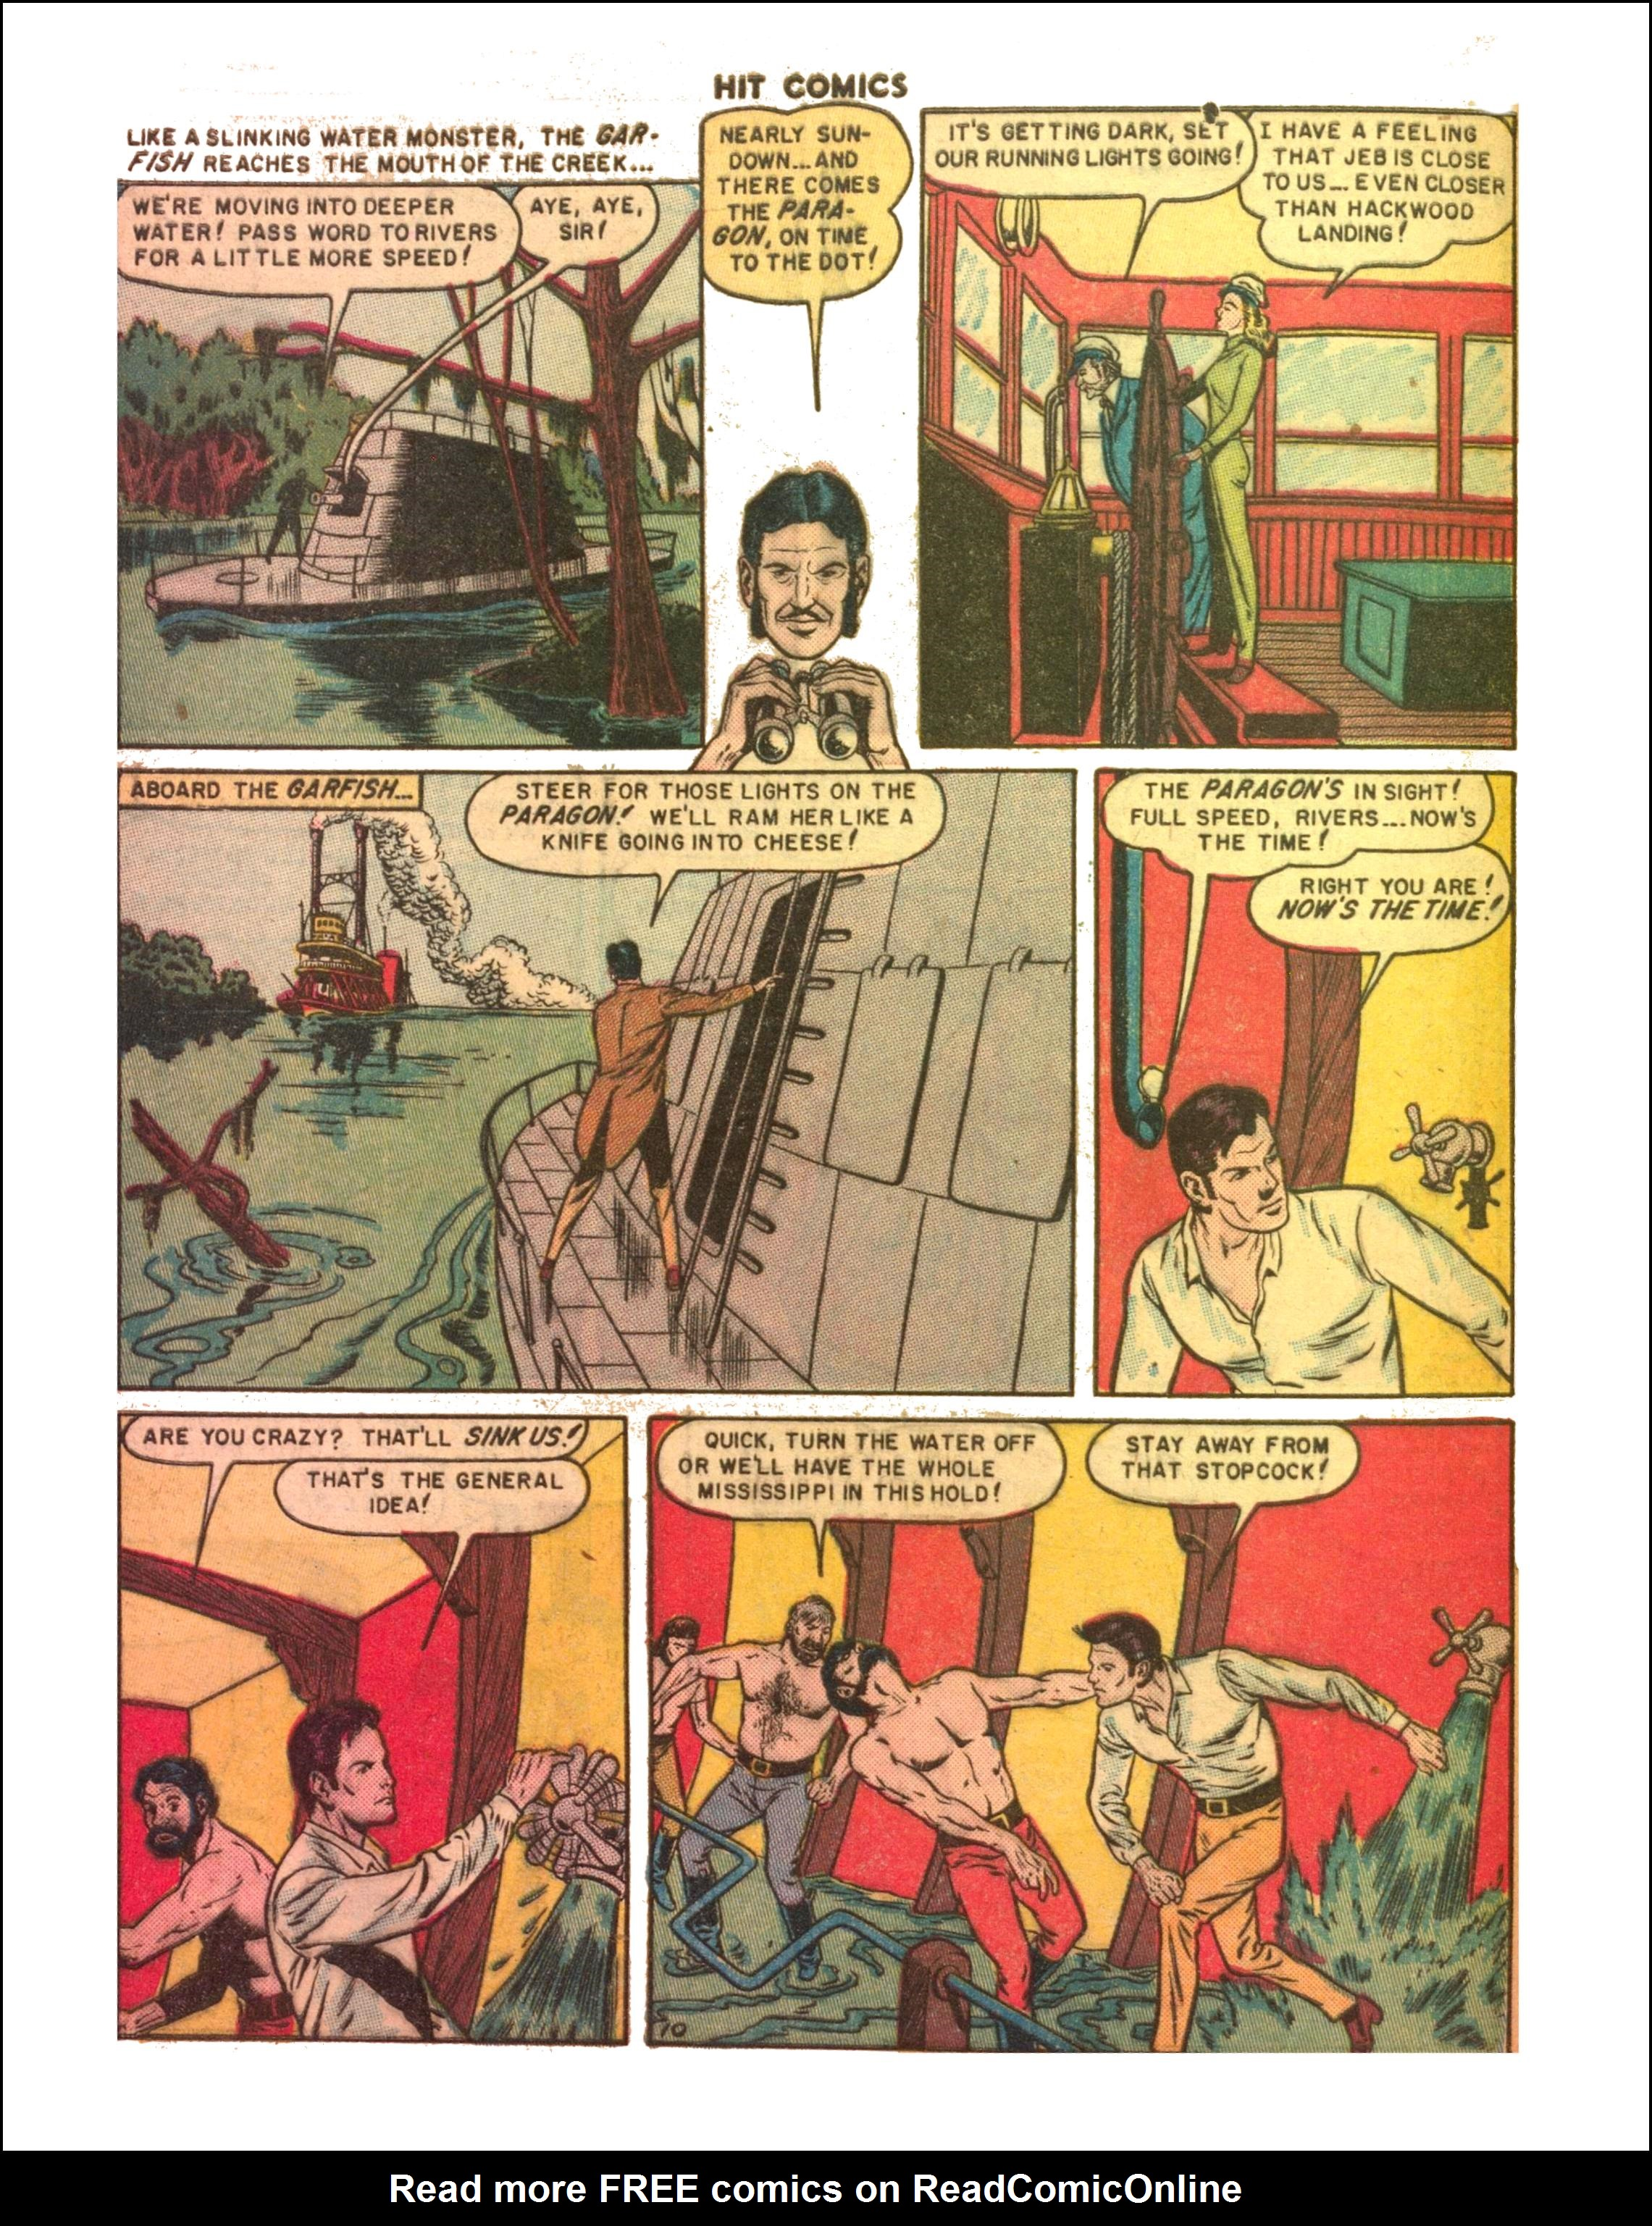 Read online Hit Comics comic -  Issue #65 - 12